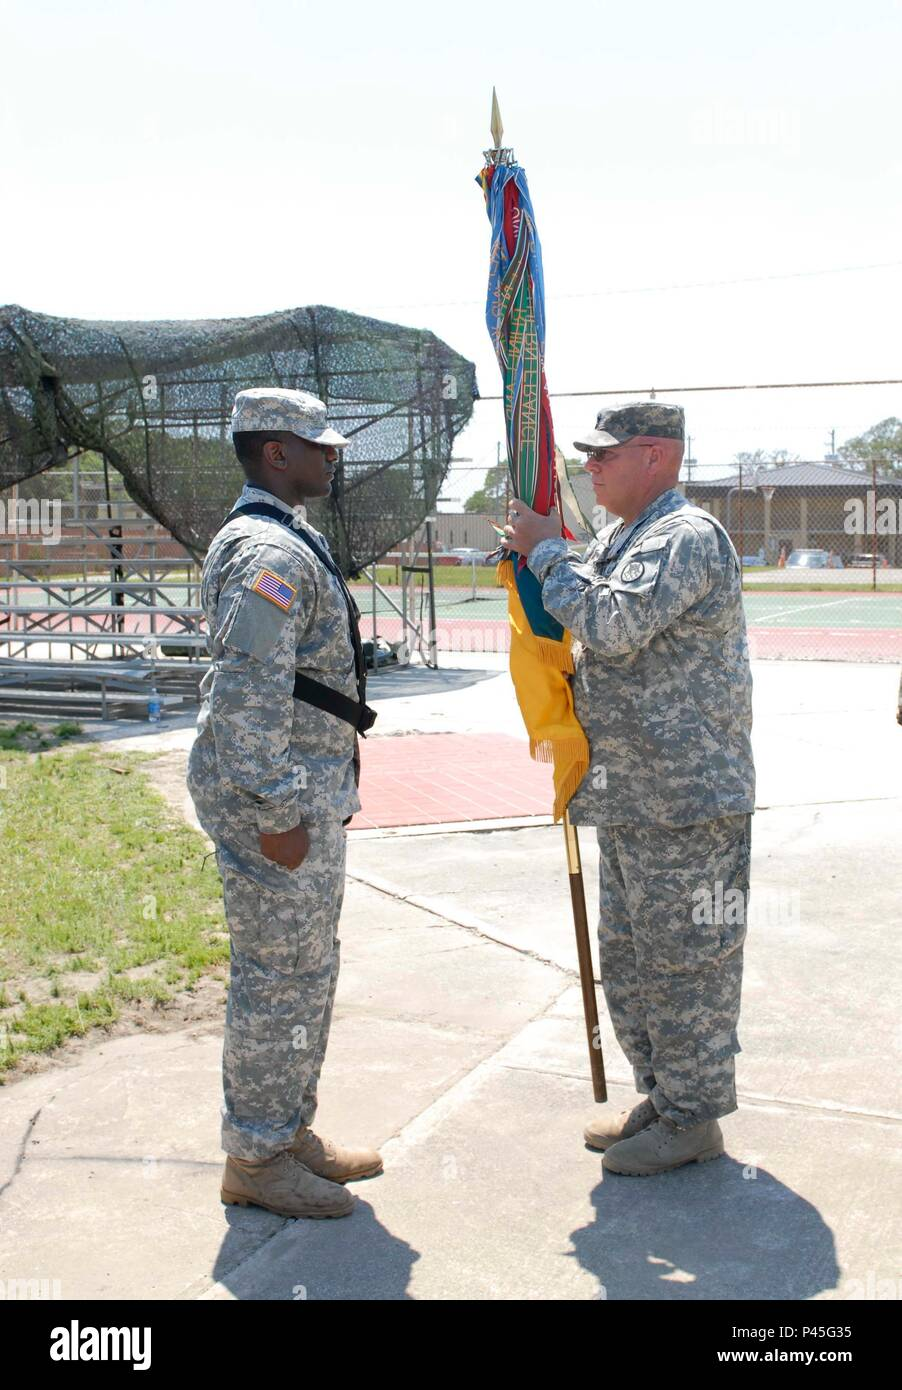 dc3a322a068 FORT FISHER, N.C. — North Carolina Army National Guard Command Sgt. Maj.  John